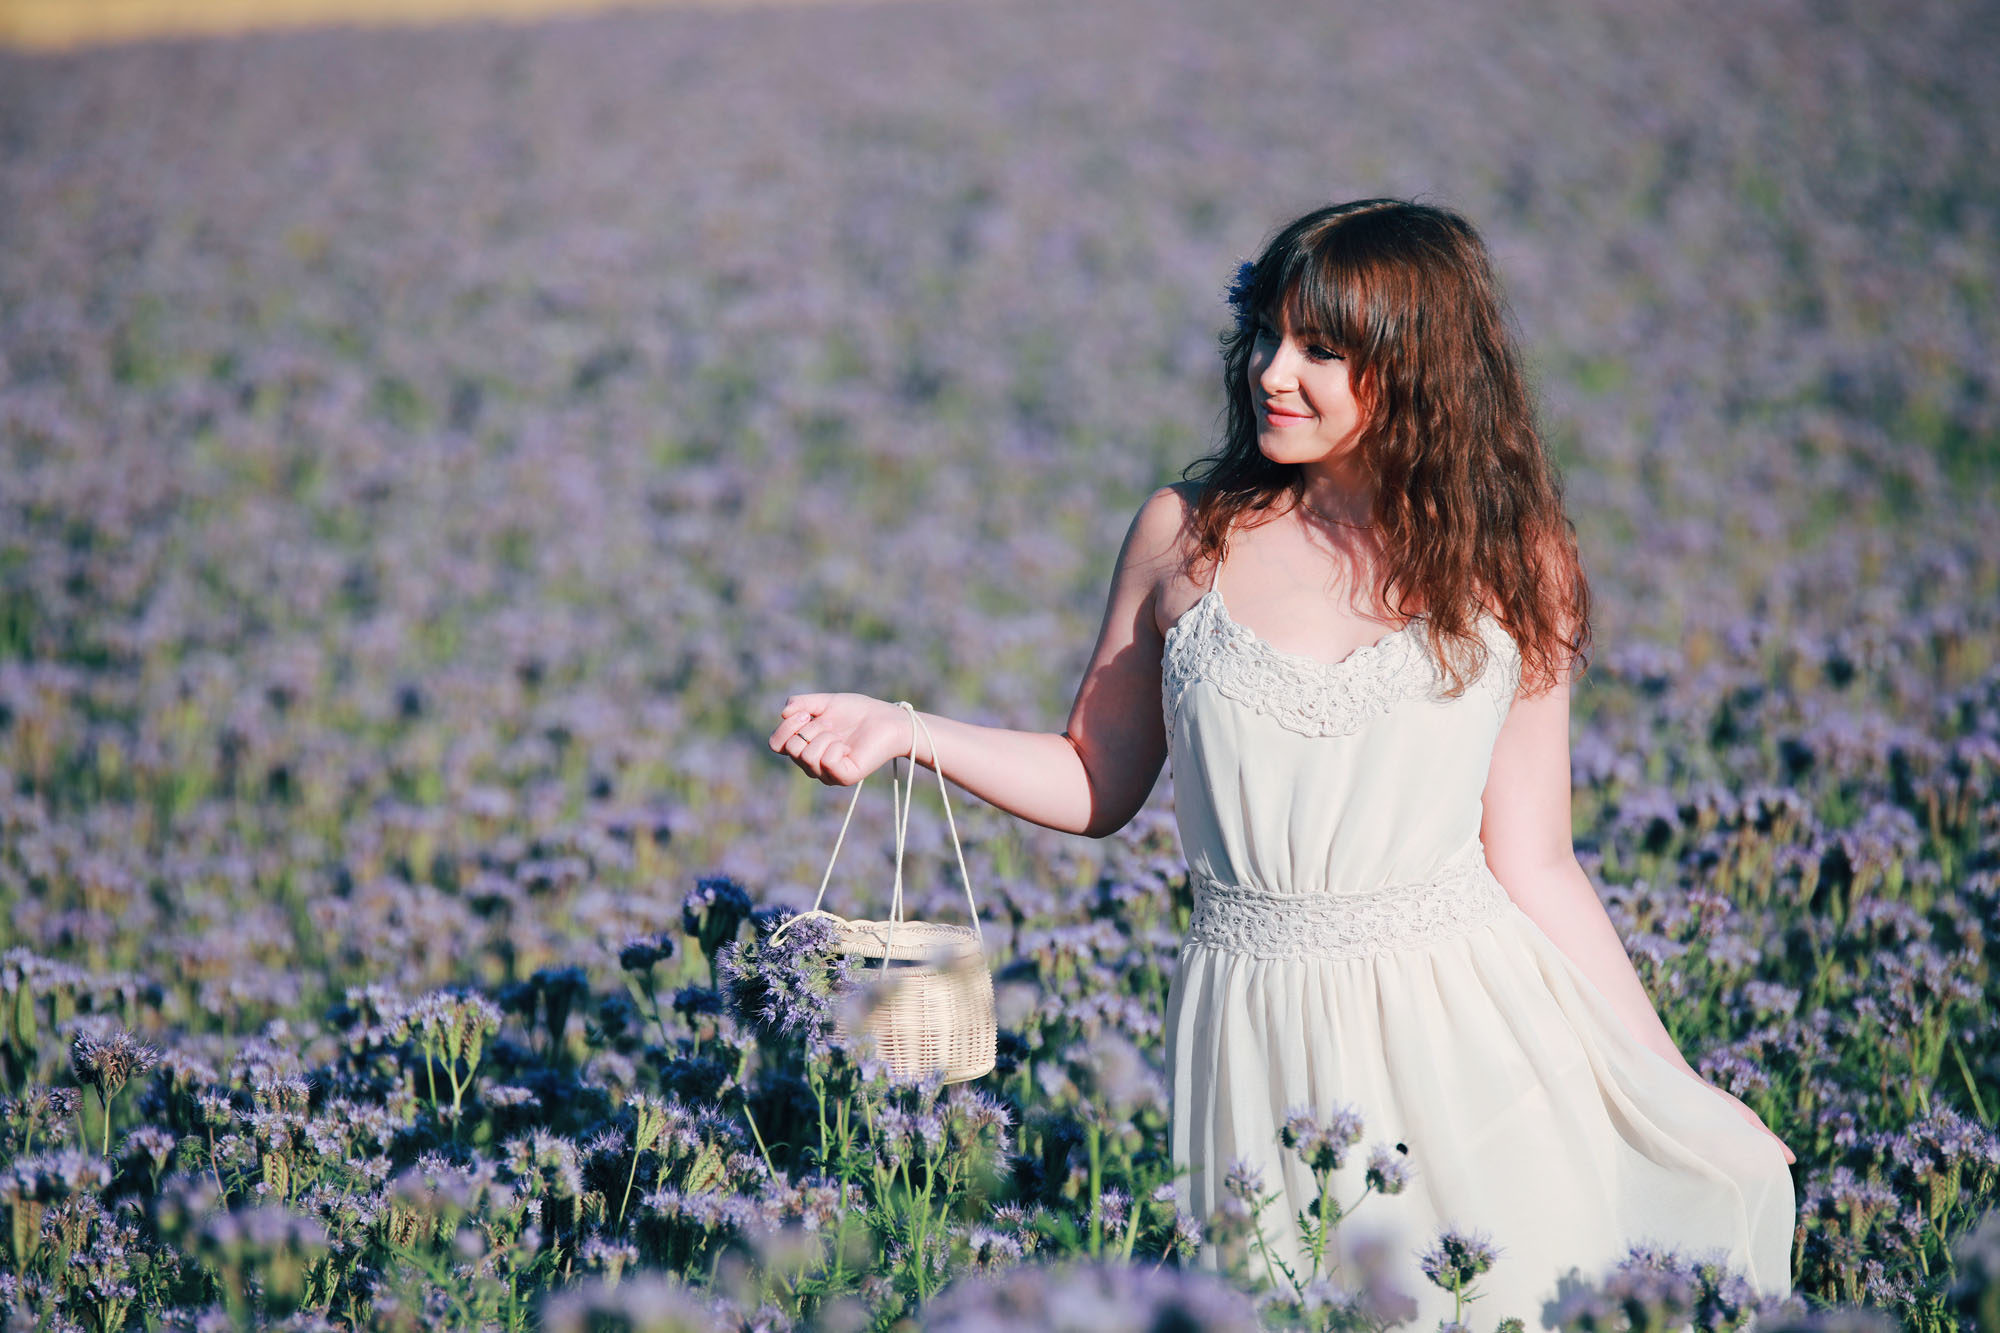 Outfit Inspiration: Romantischer Sommer Look mitten im Blumenmeer